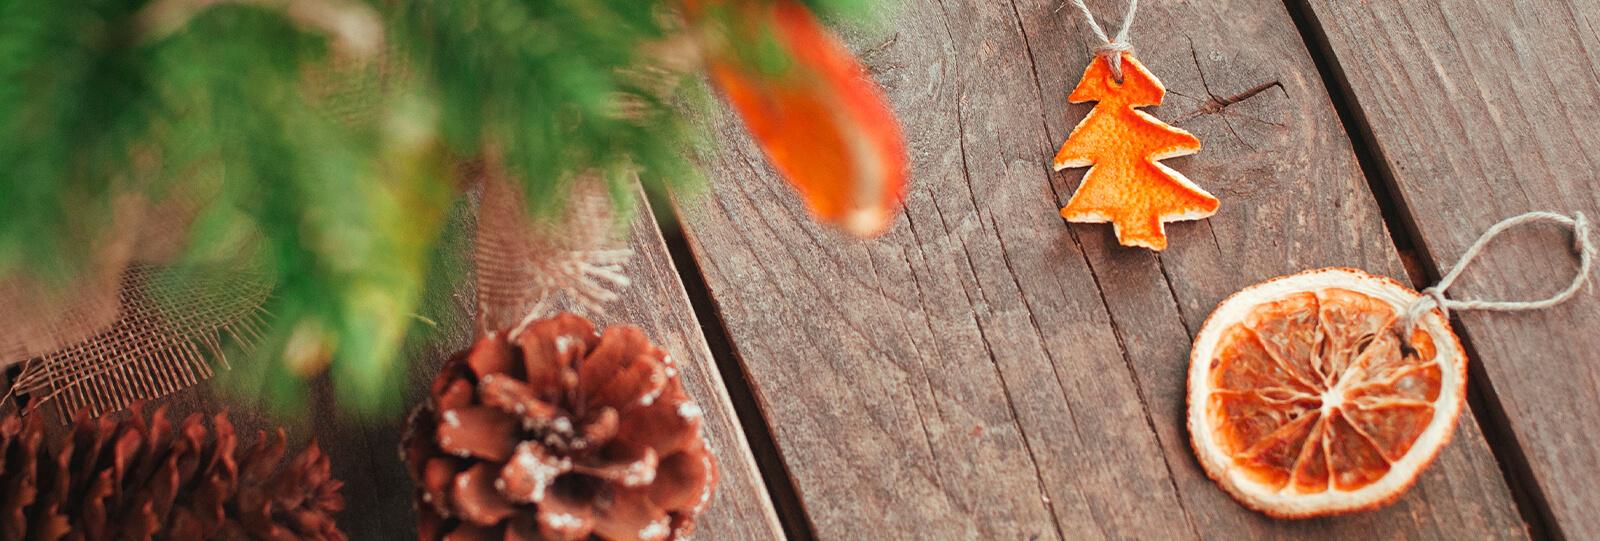 PFAS-christmas-tree-trends-citrus-orange-ornaments-pine-cones-header